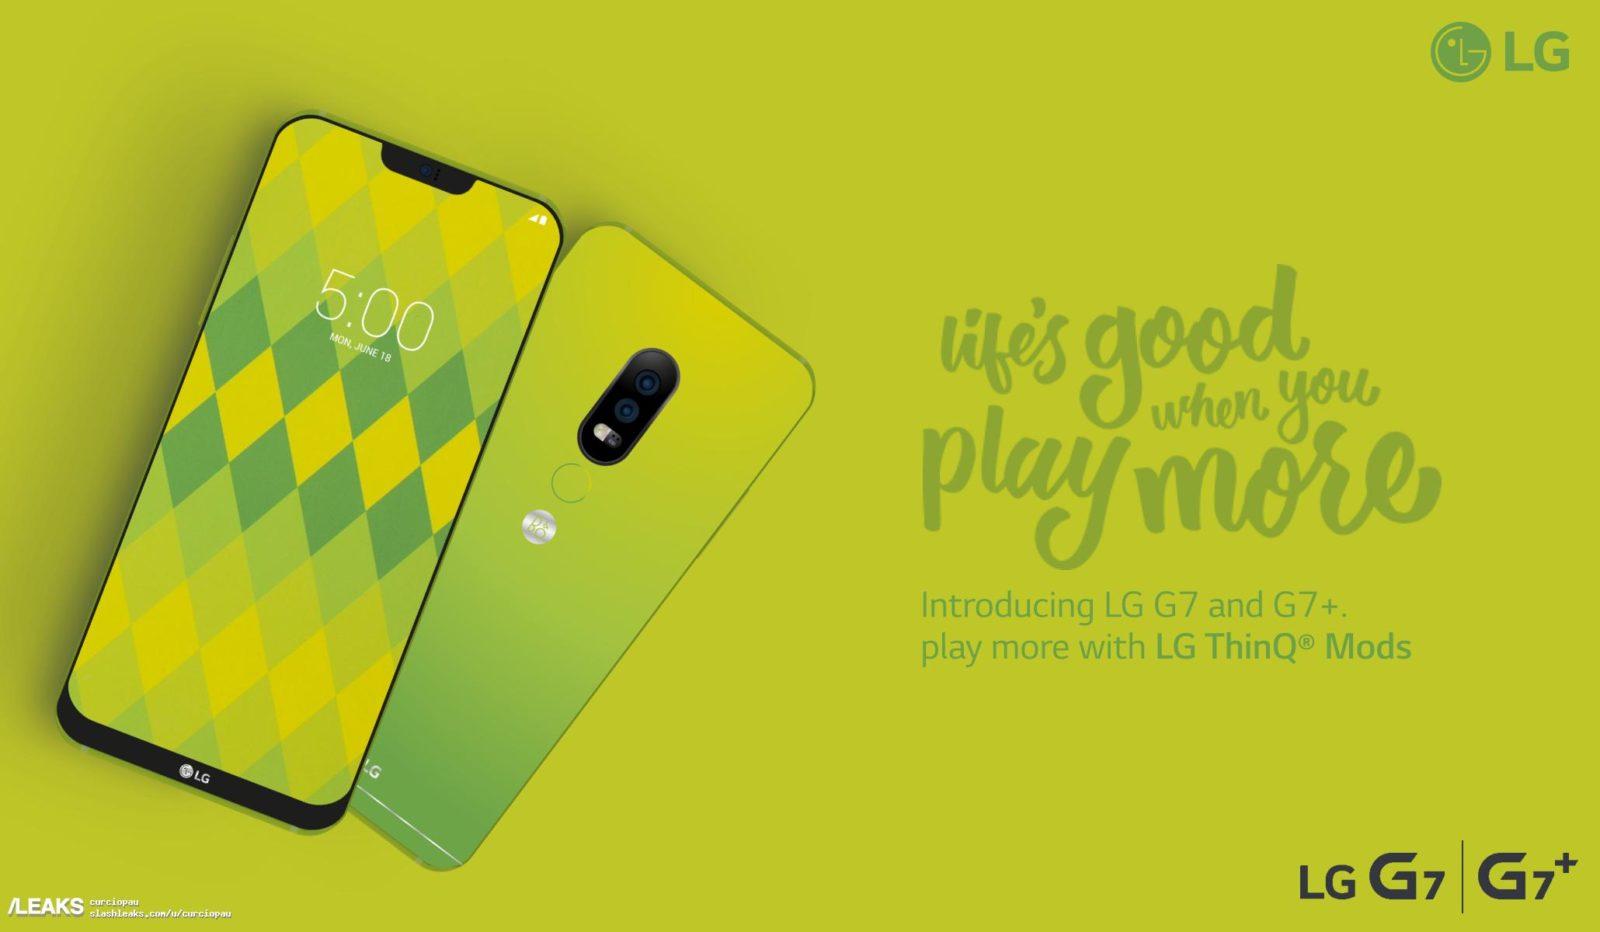 LG G7 reklam afişi internete düştü